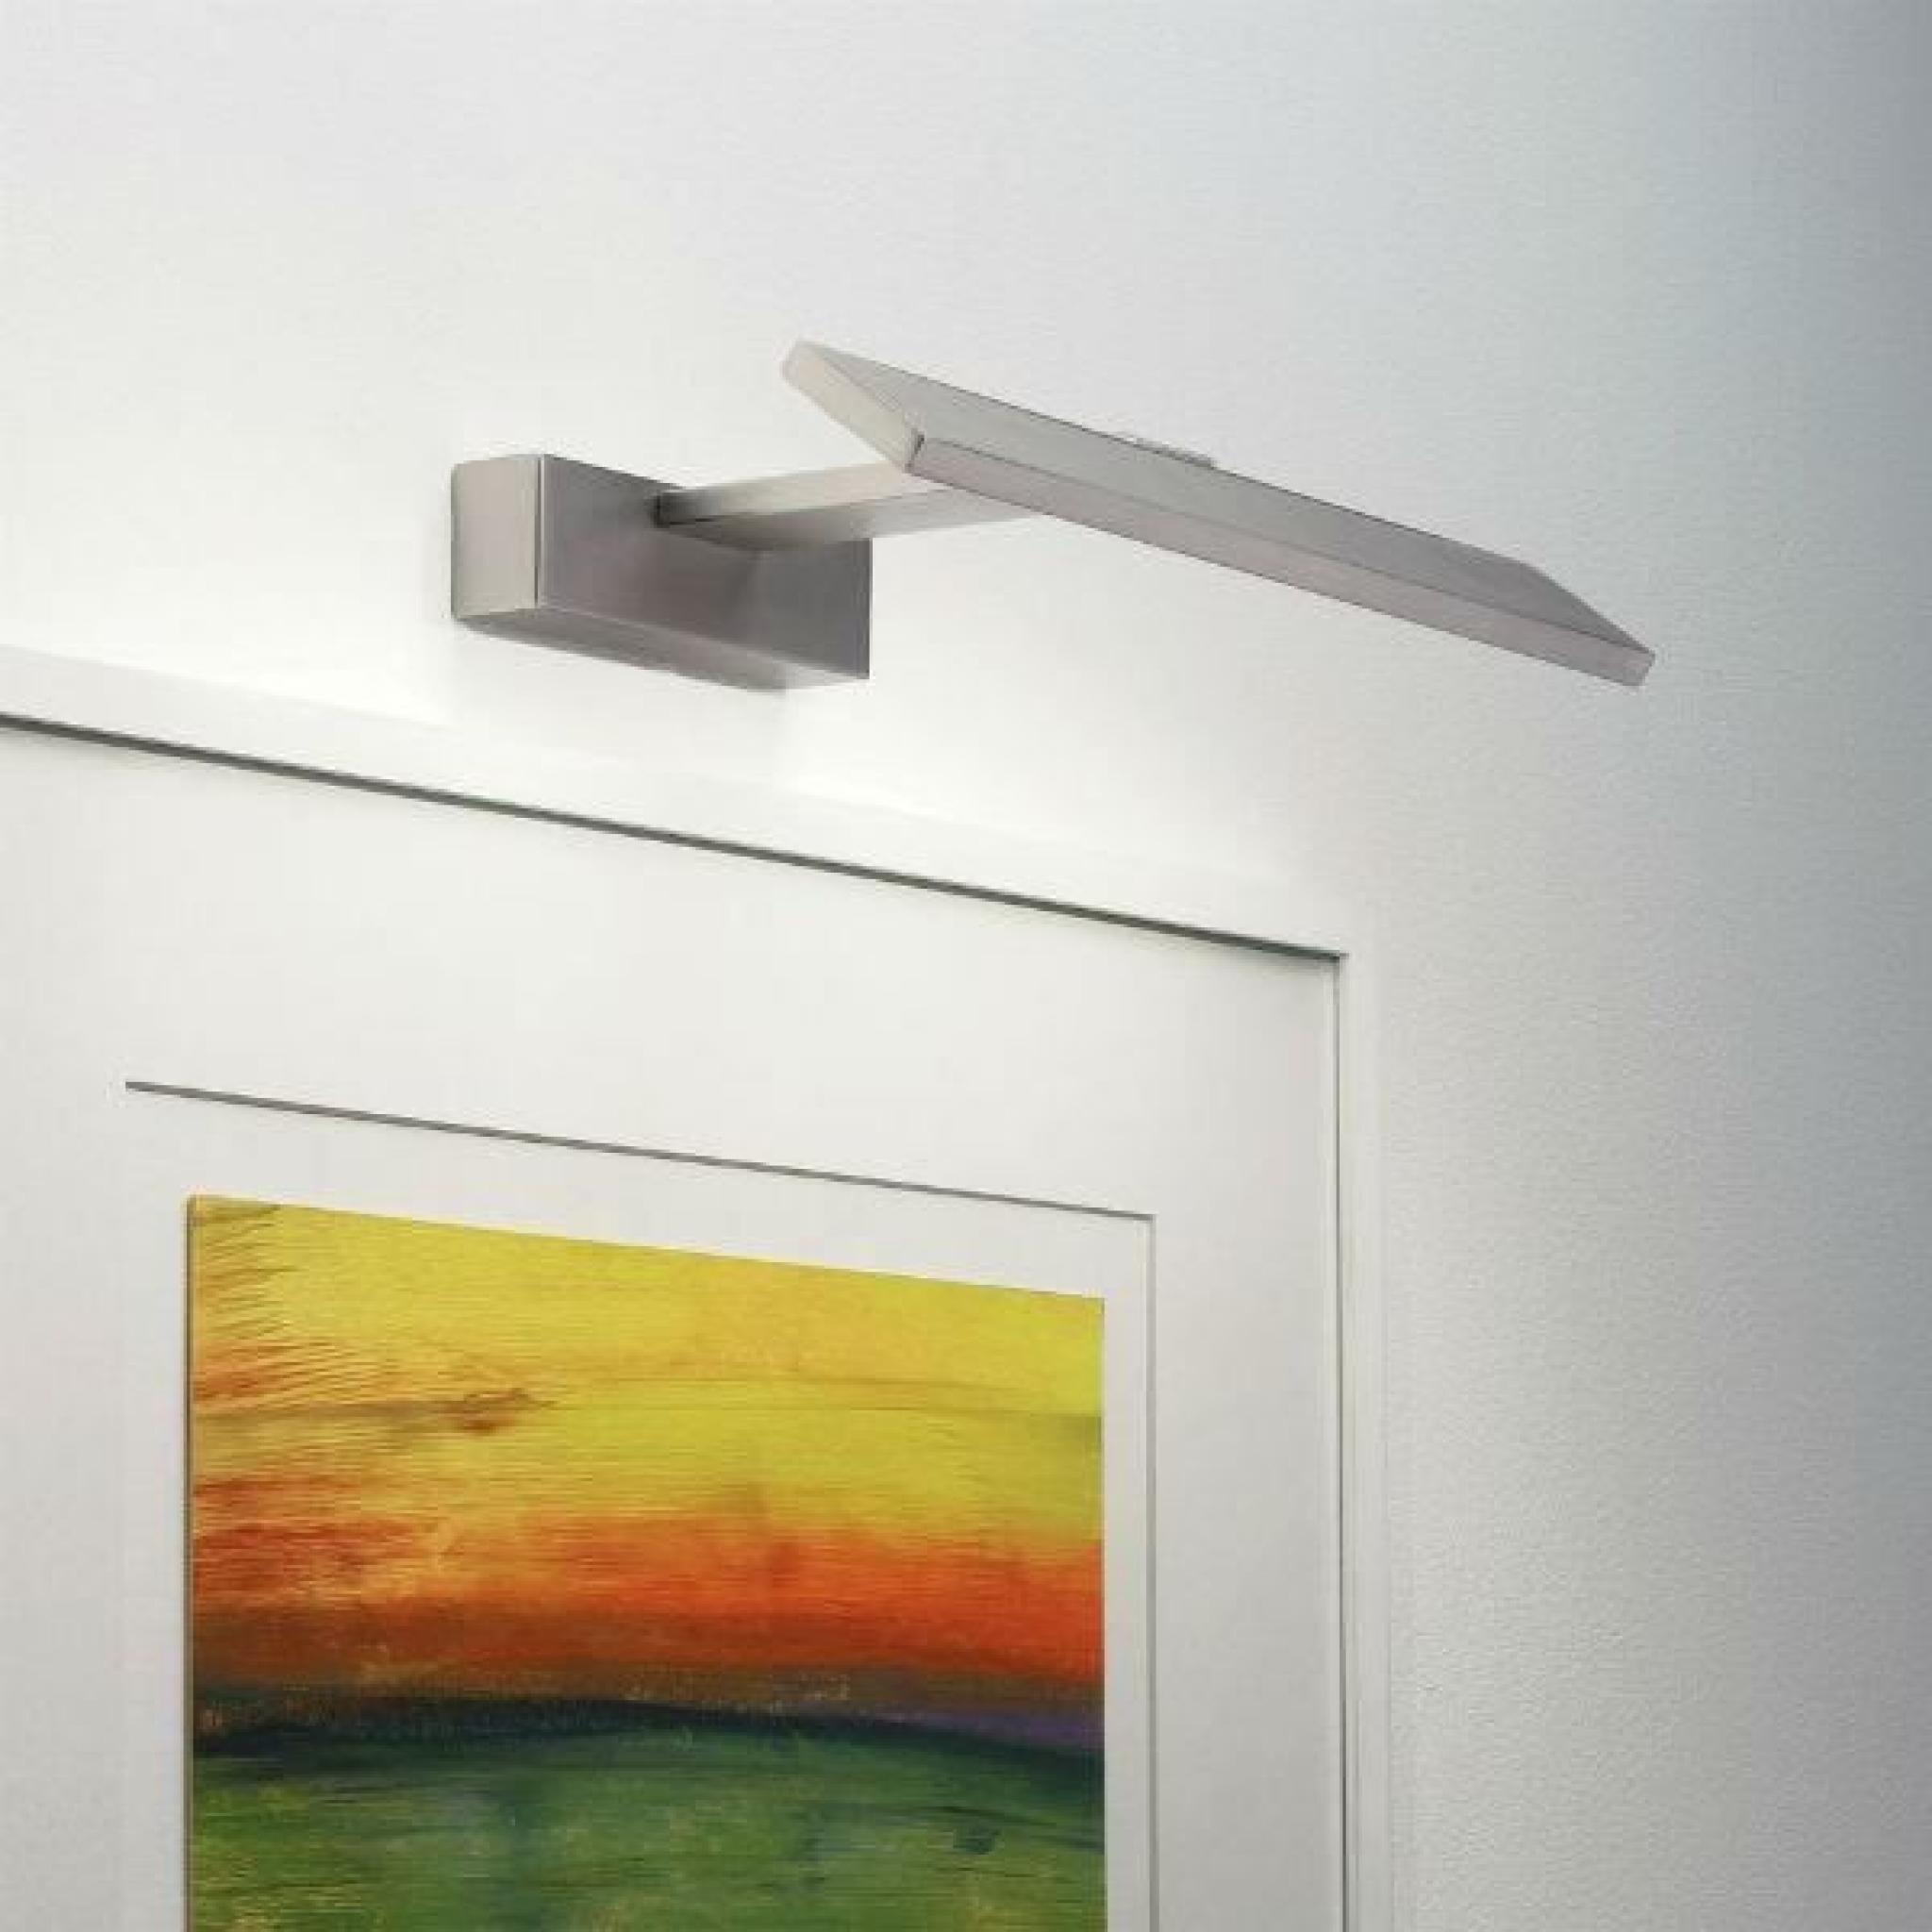 Applique Lighting Pour 300 Astro Tableau Vermeer nN08mwvO